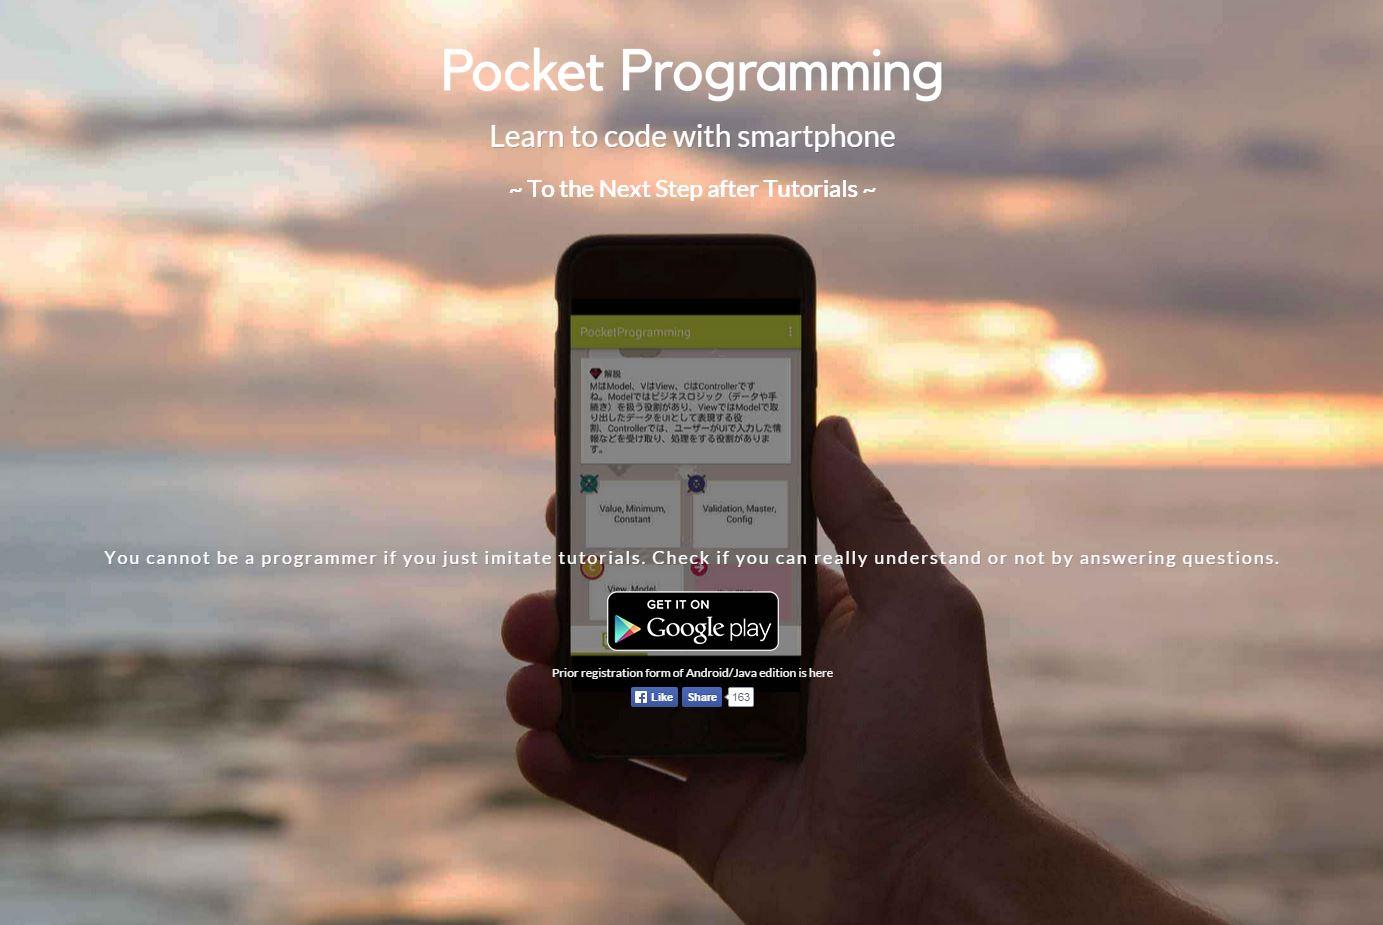 Pocket Programming helps beginners polish their coding skills